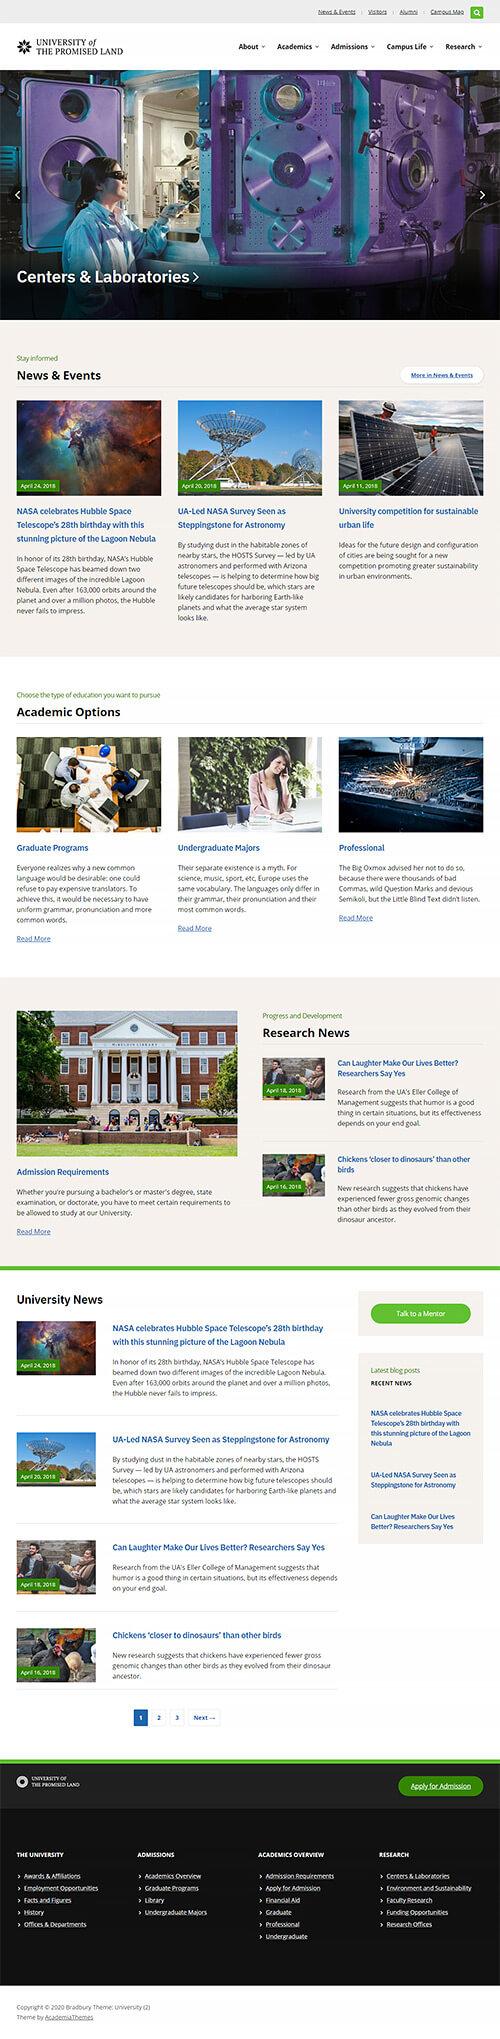 University Website Demo #2: Homepage